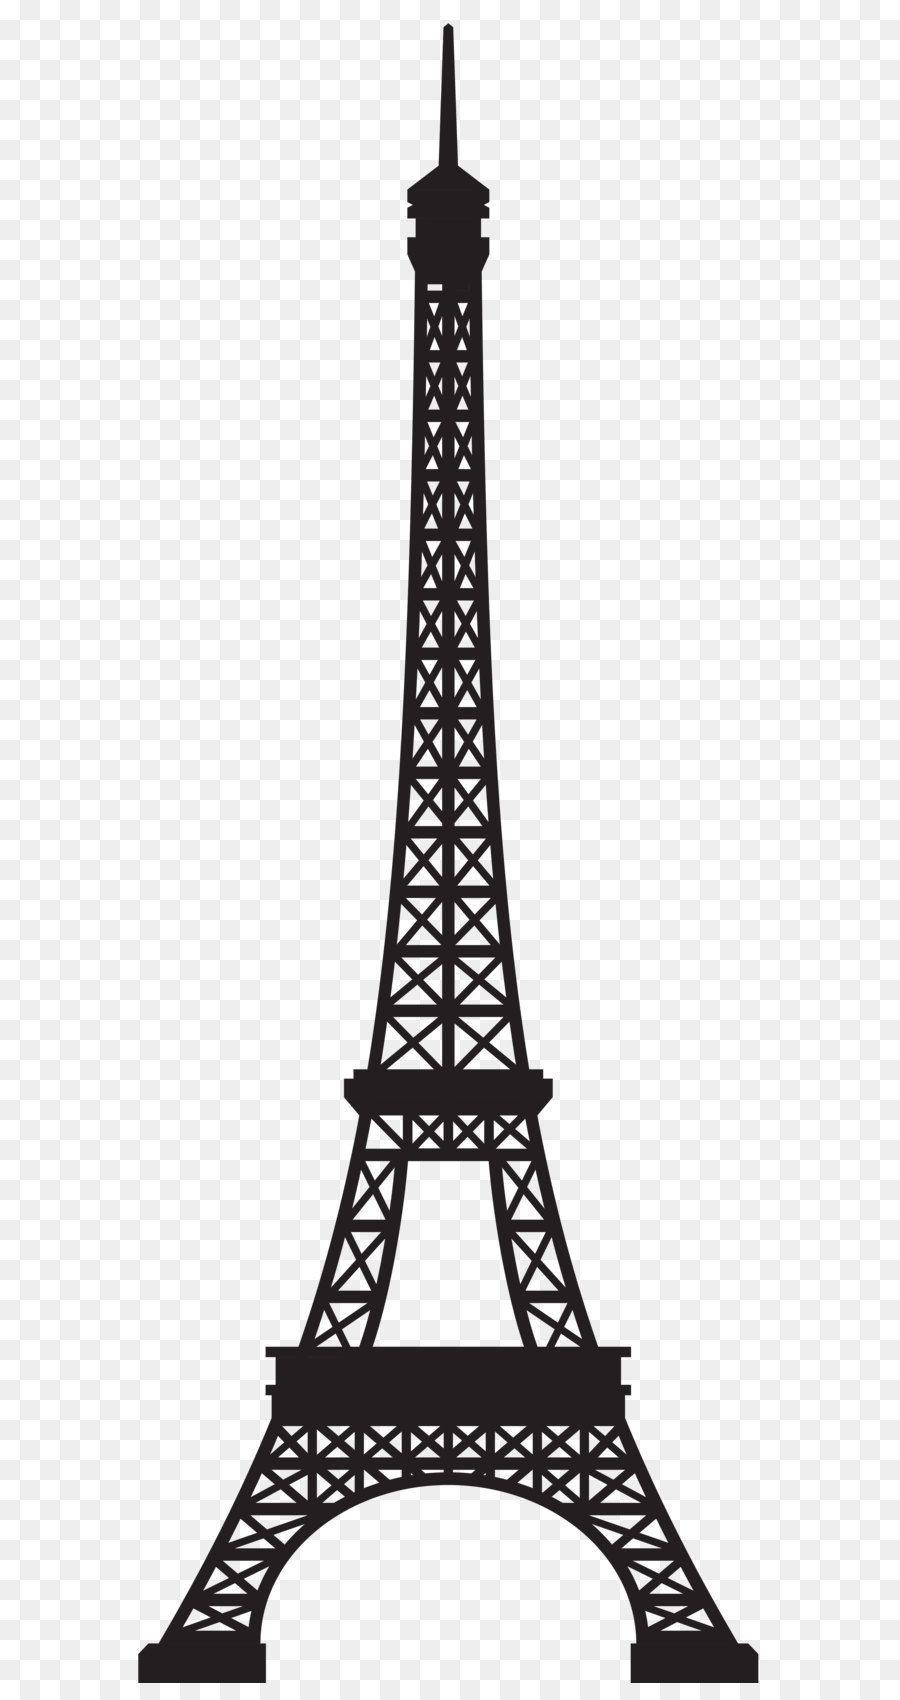 Eiffel Tower Landmark Clip Art Eiffel Tower Silhouette Png Clip Art Image Unlimited Down Eiffel Tower Drawing Eiffel Tower Painting Eiffel Tower Silhouette